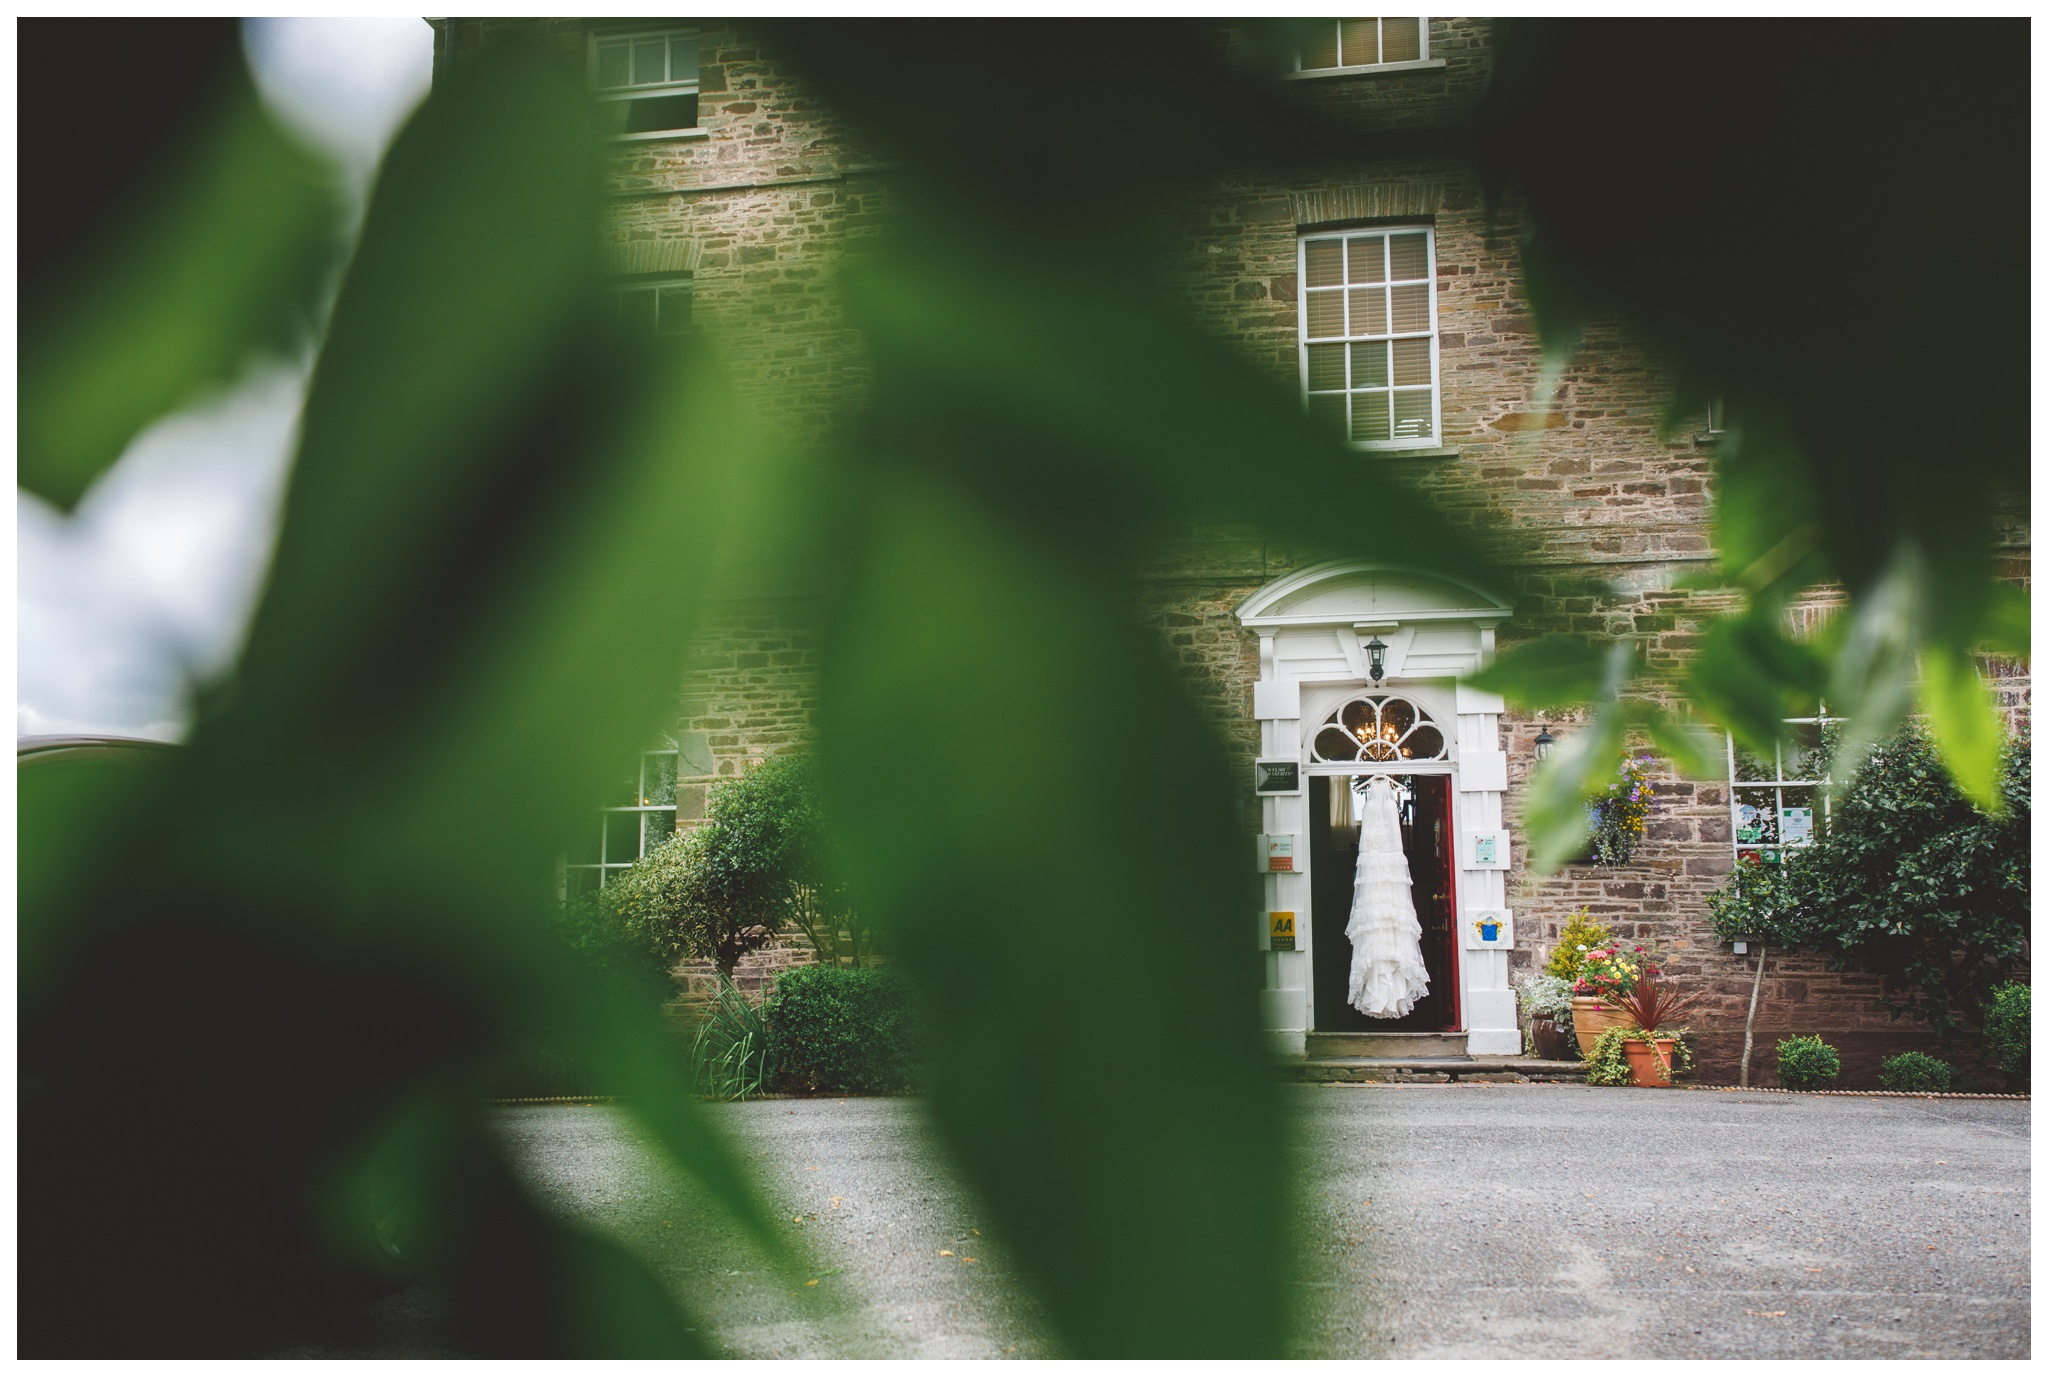 Richard Savage Photography - Wedding - Peterstone Court Brecon - 2016-05-11_0005